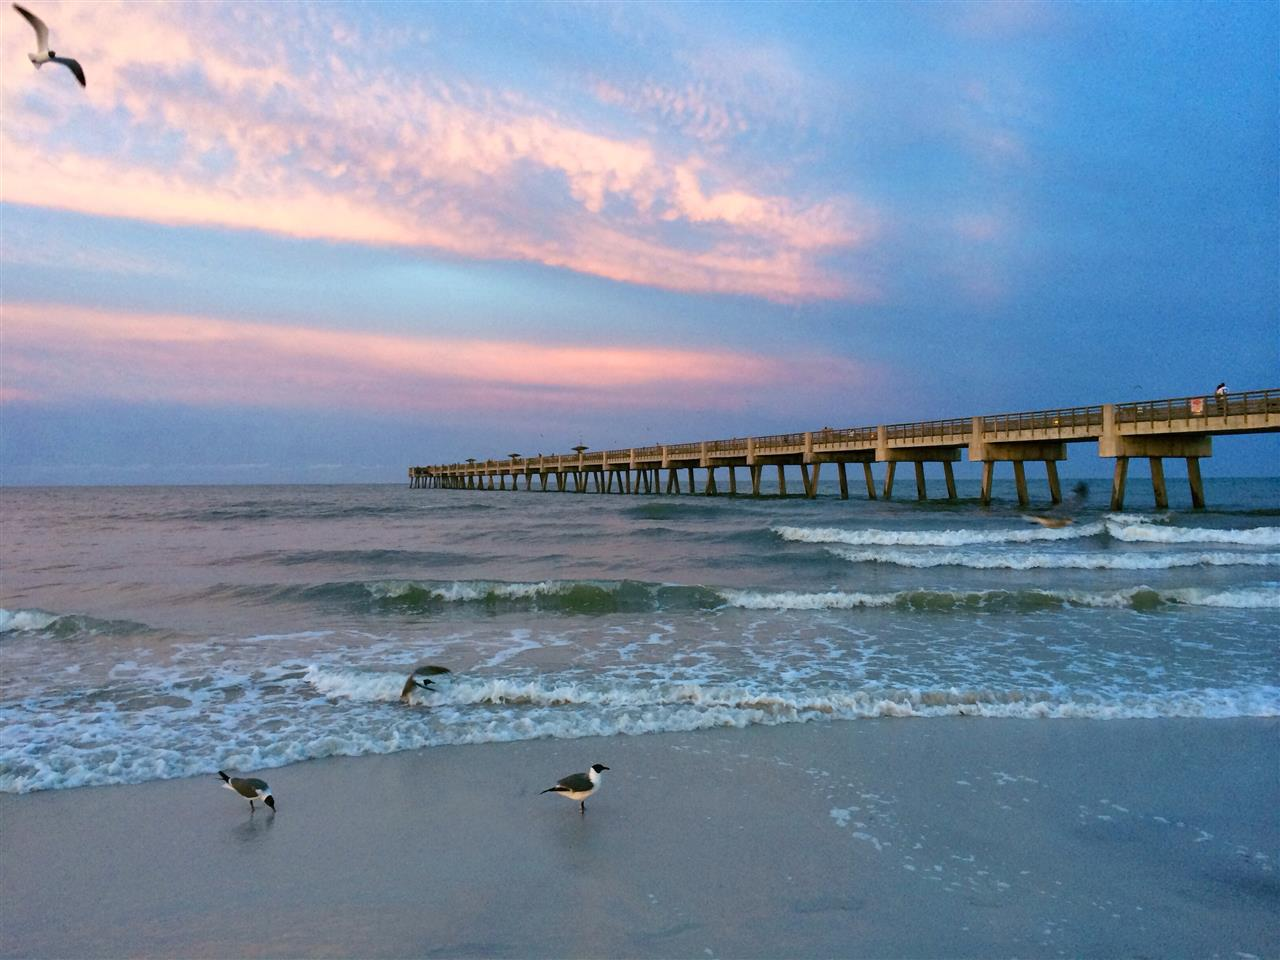 Sunset at the pier in Jacksonville Beach, FL #sunset #jacksonvillebeach #florida #beach